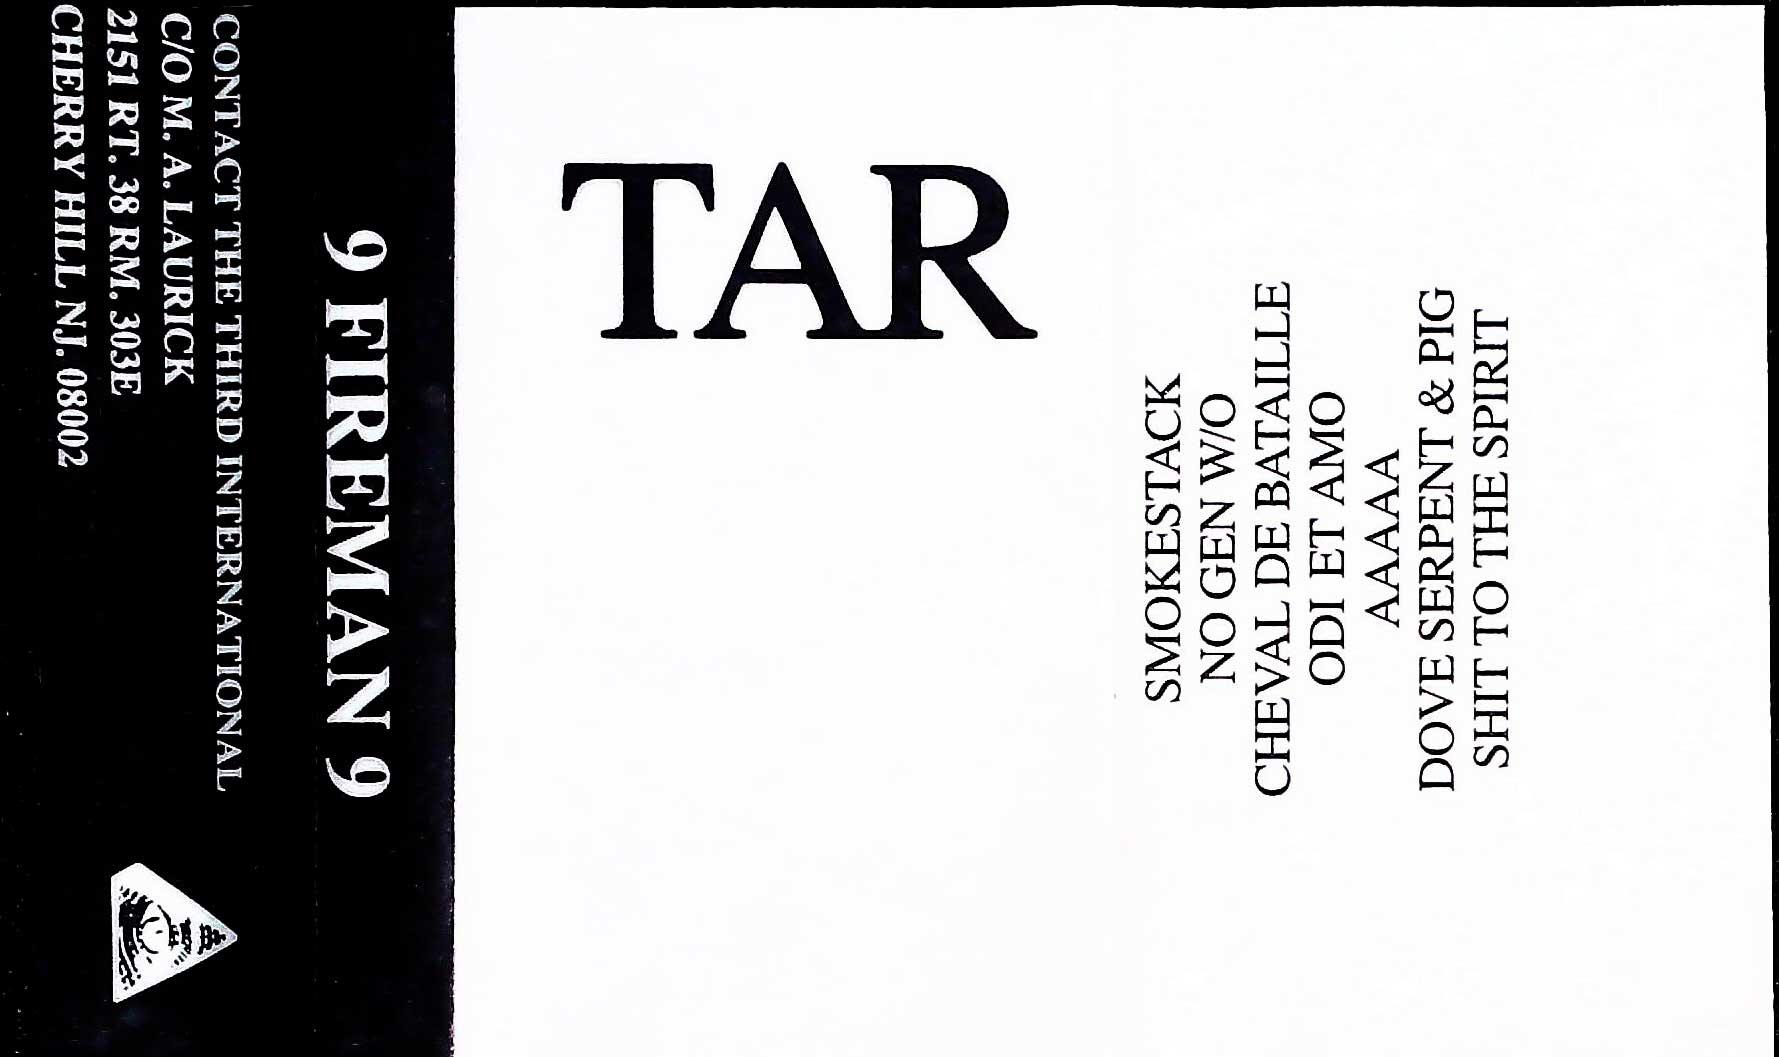 tape-case